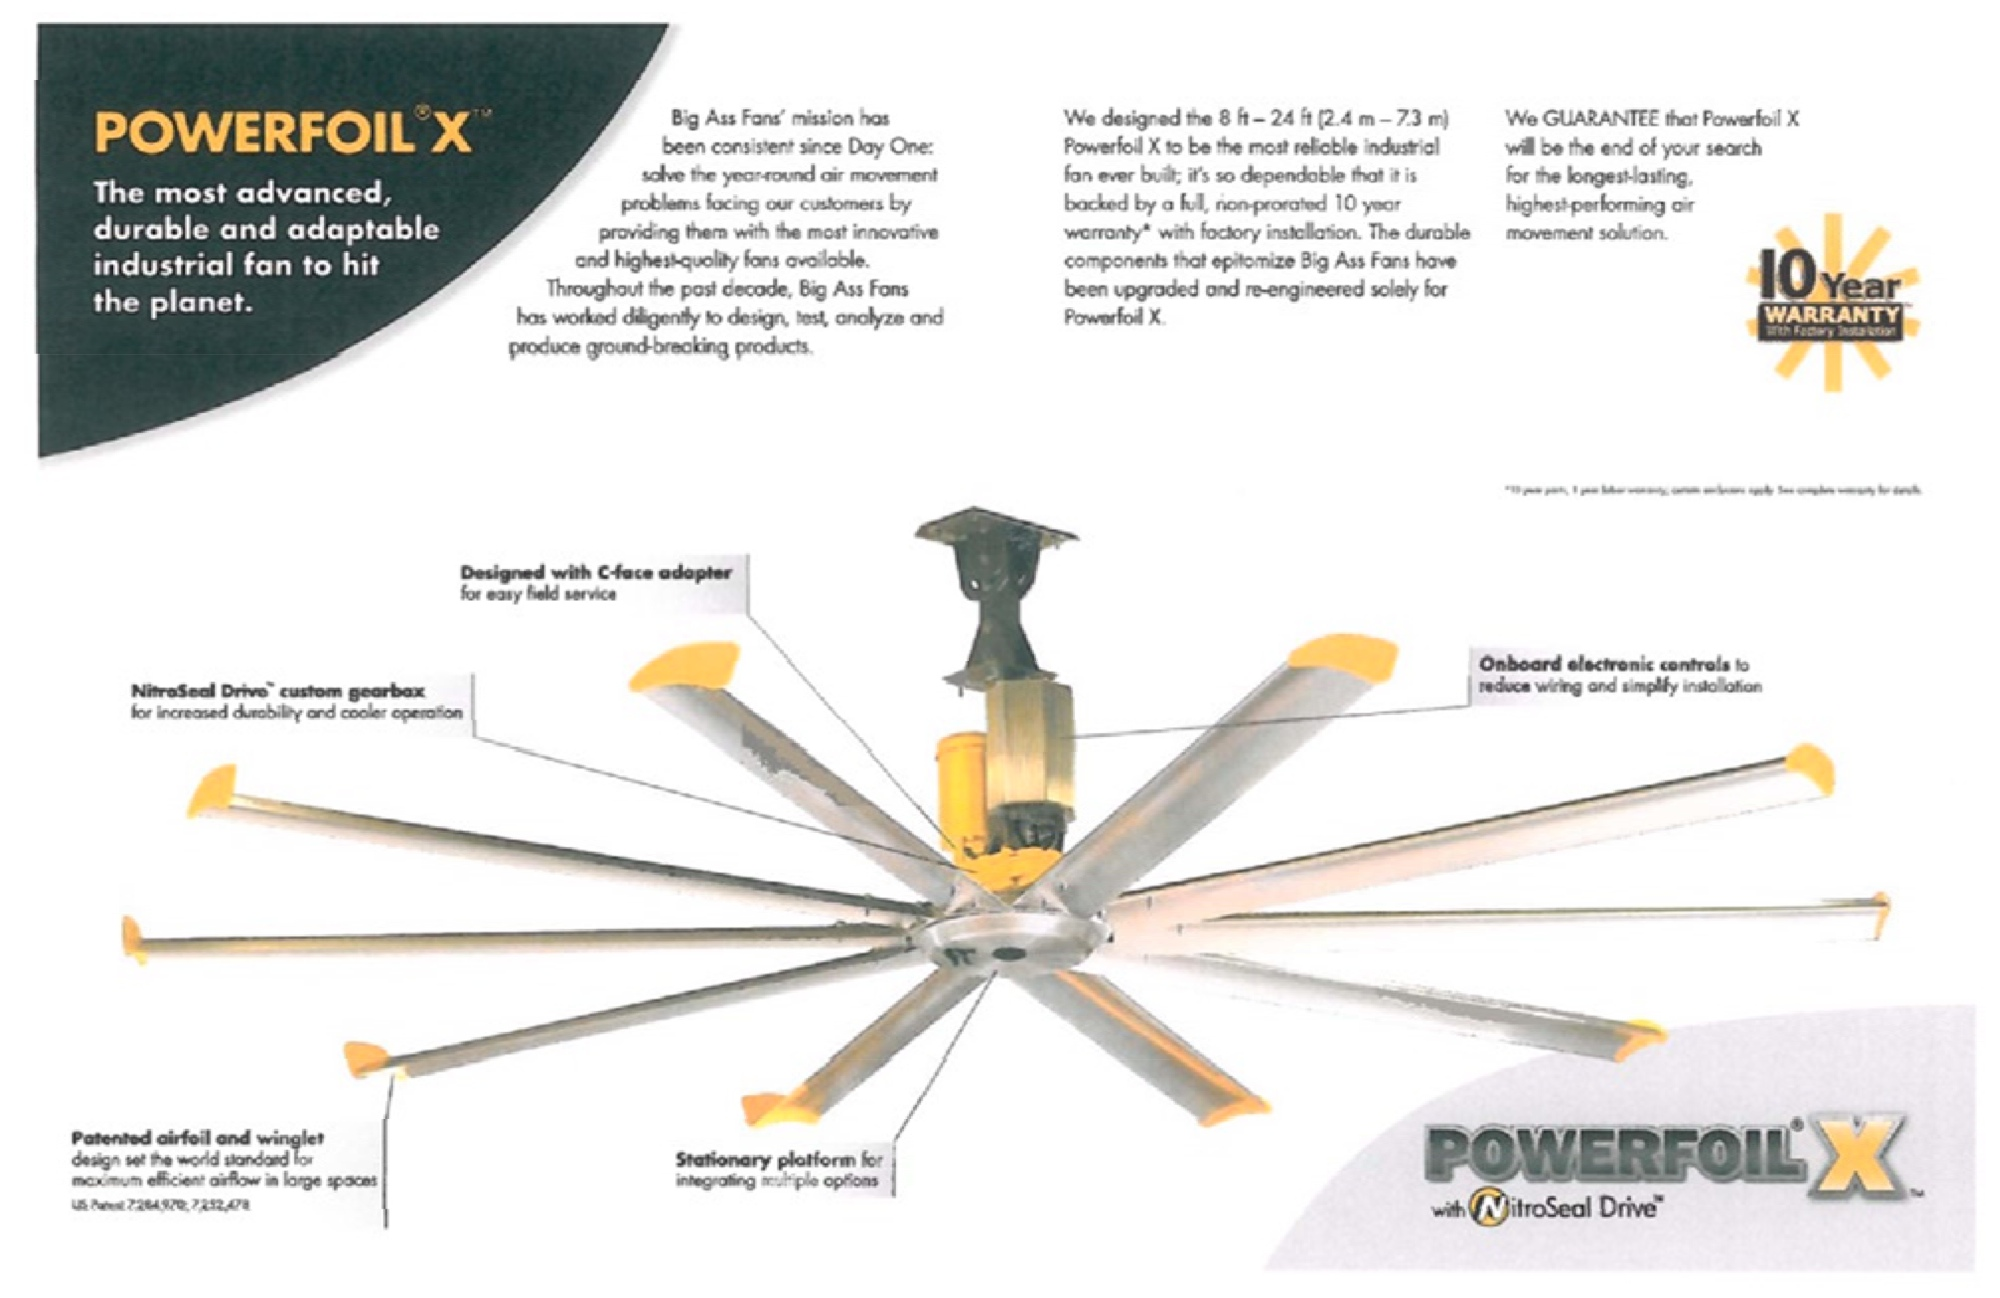 PowerFoil X copy